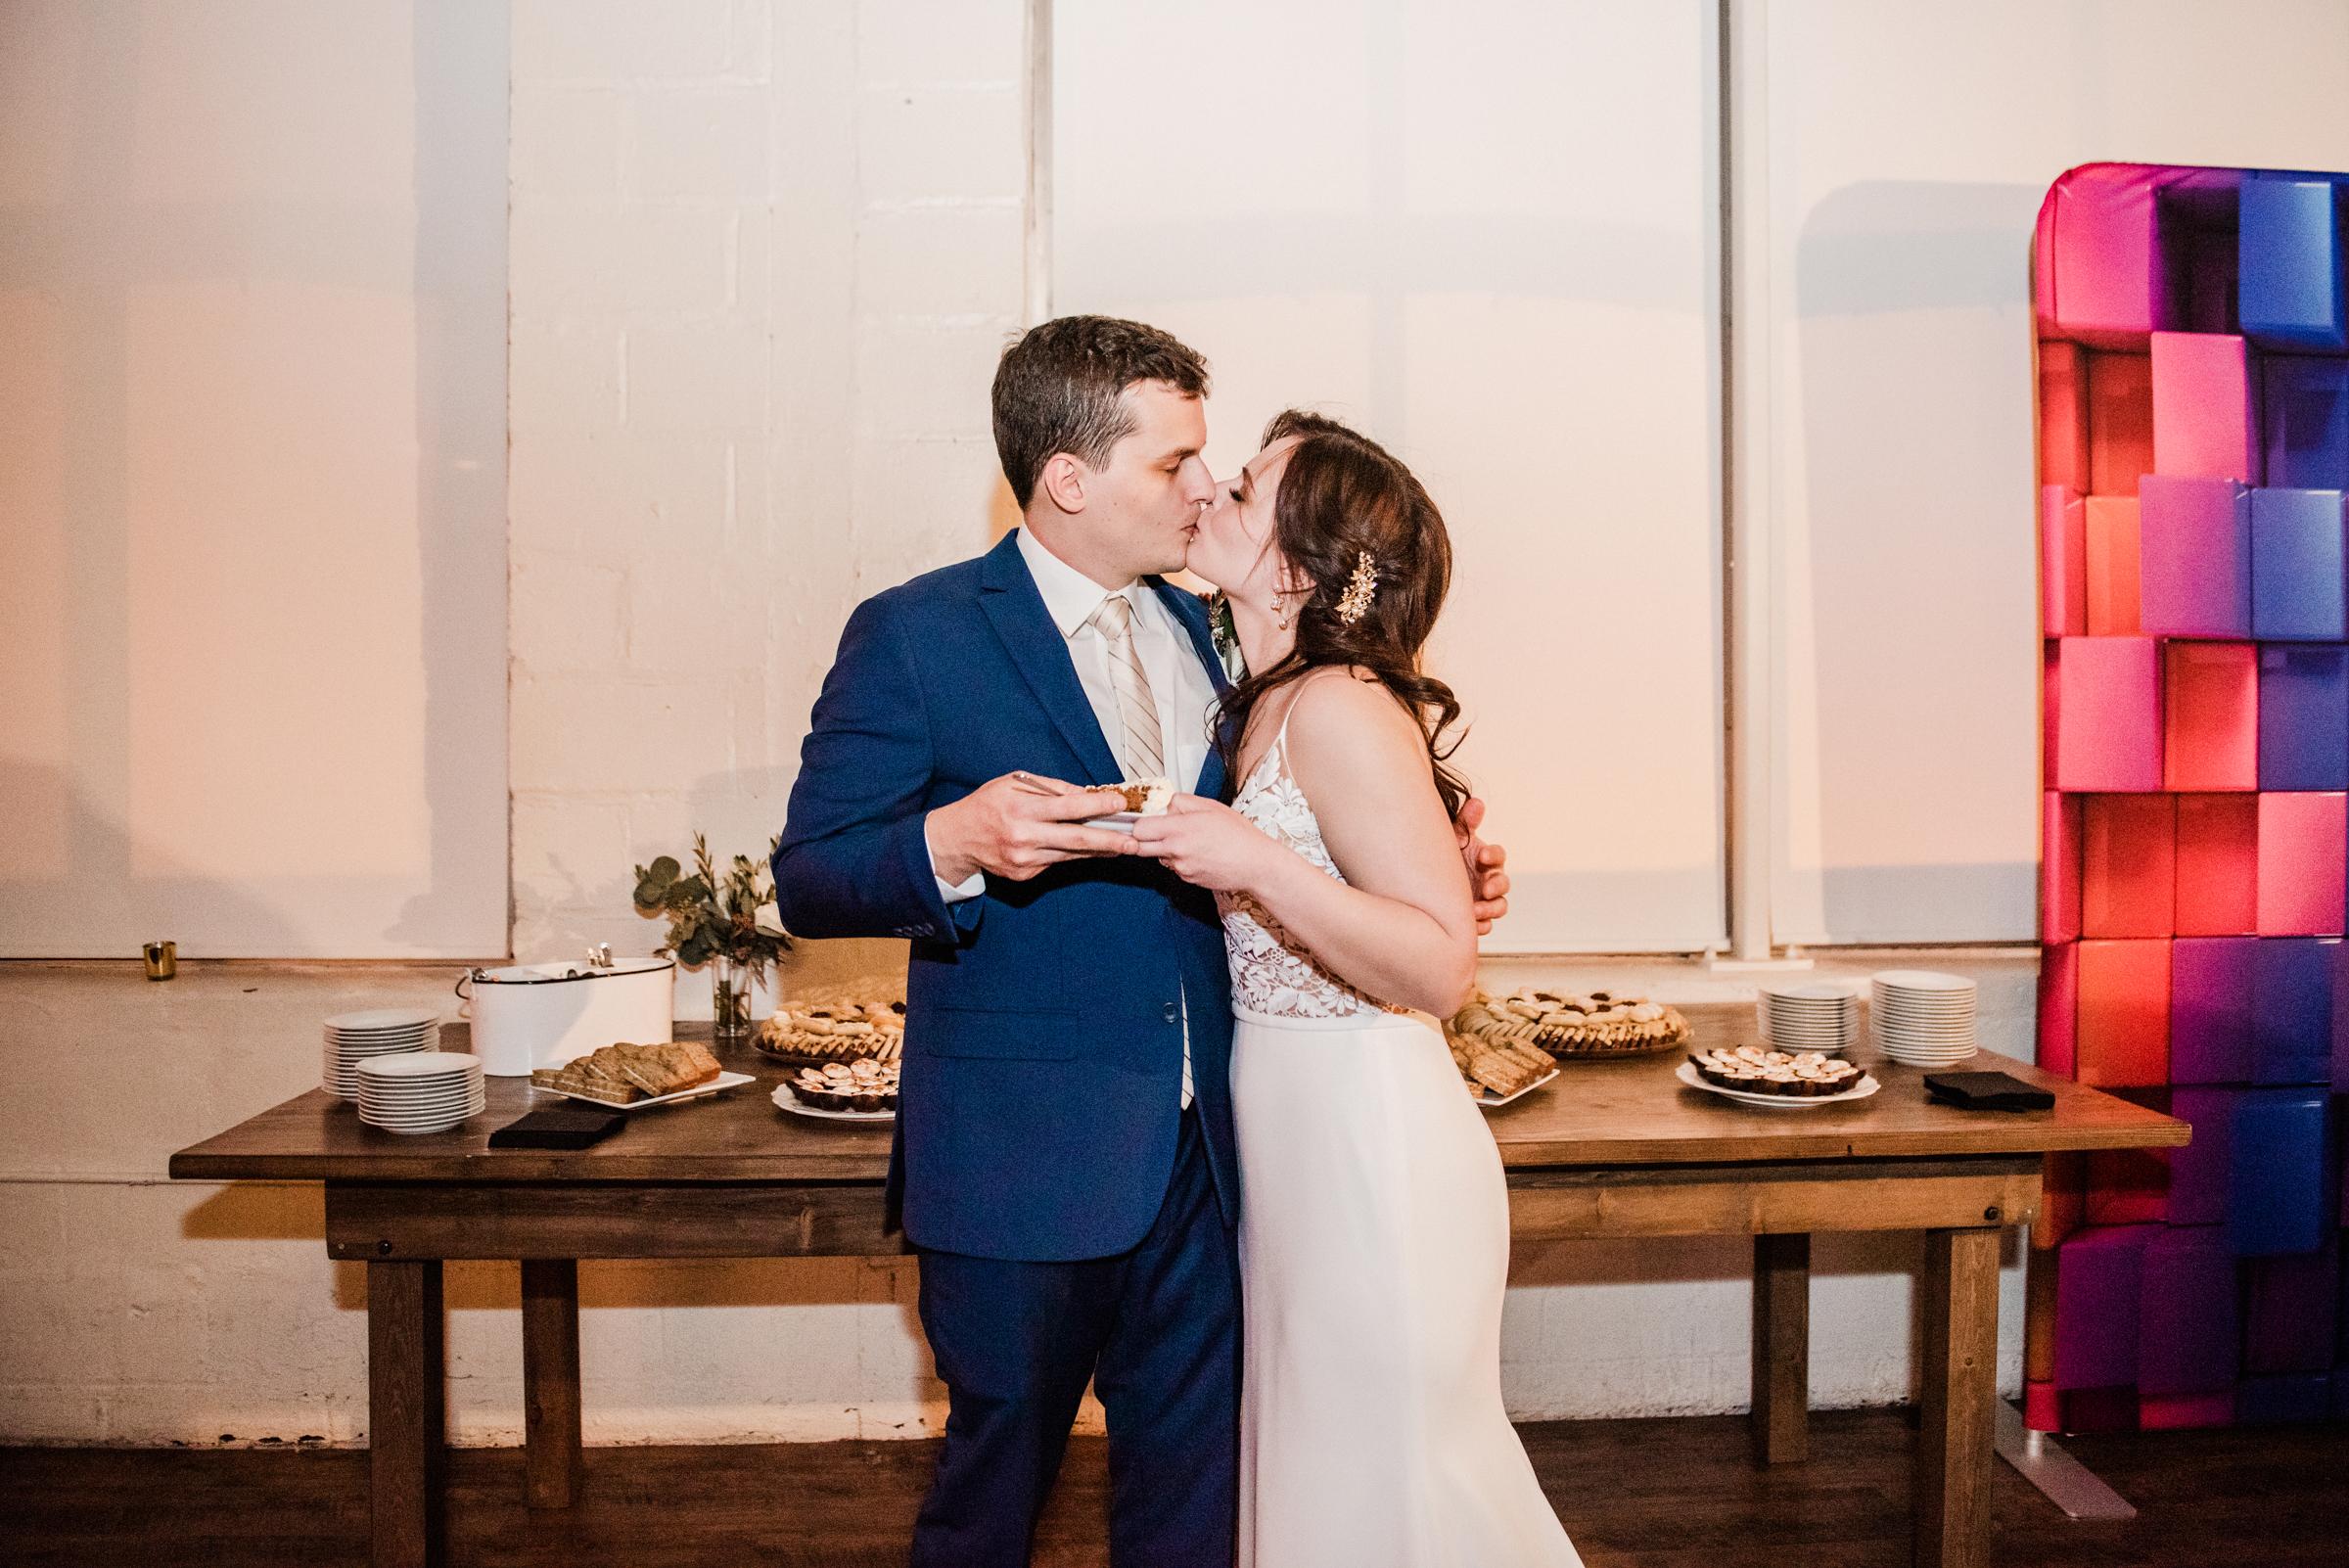 The_Arbor_LoftRochester_Wedding_JILL_STUDIO_Rochester_NY_Photographer_202353.jpg